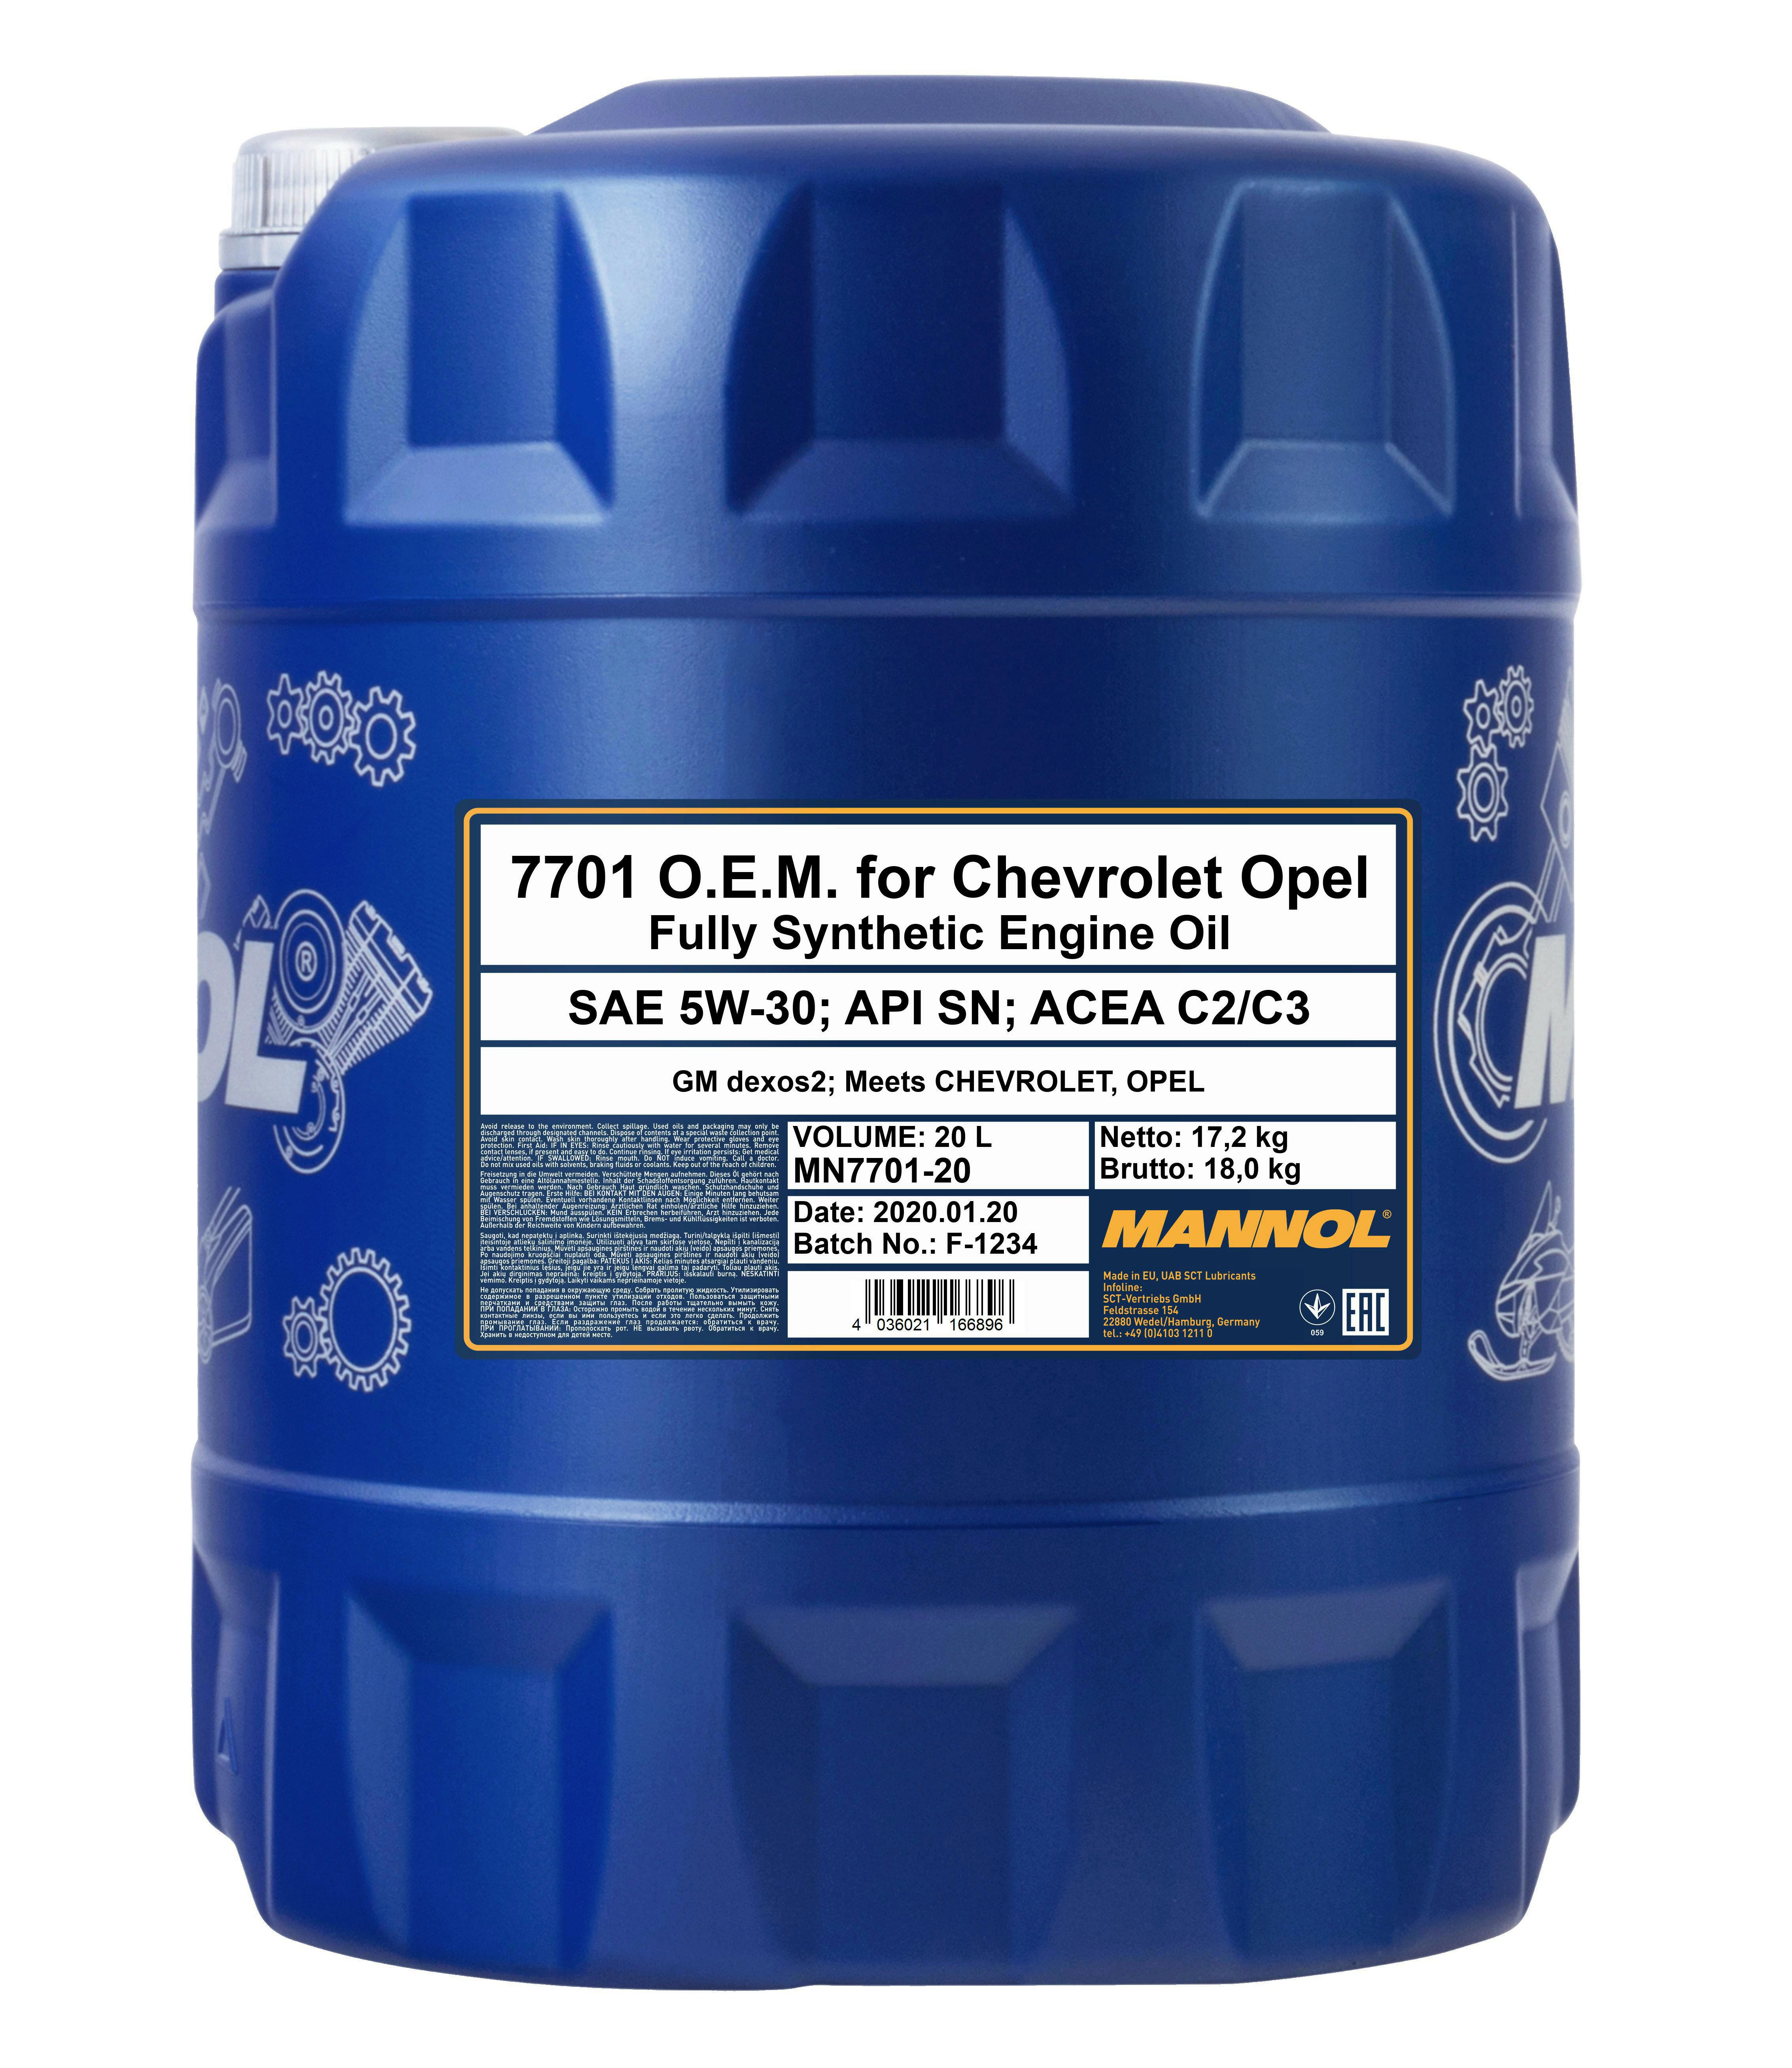 MANNOL MN7701-20 O.E.M. 5W-30 20 Liter Dexos2